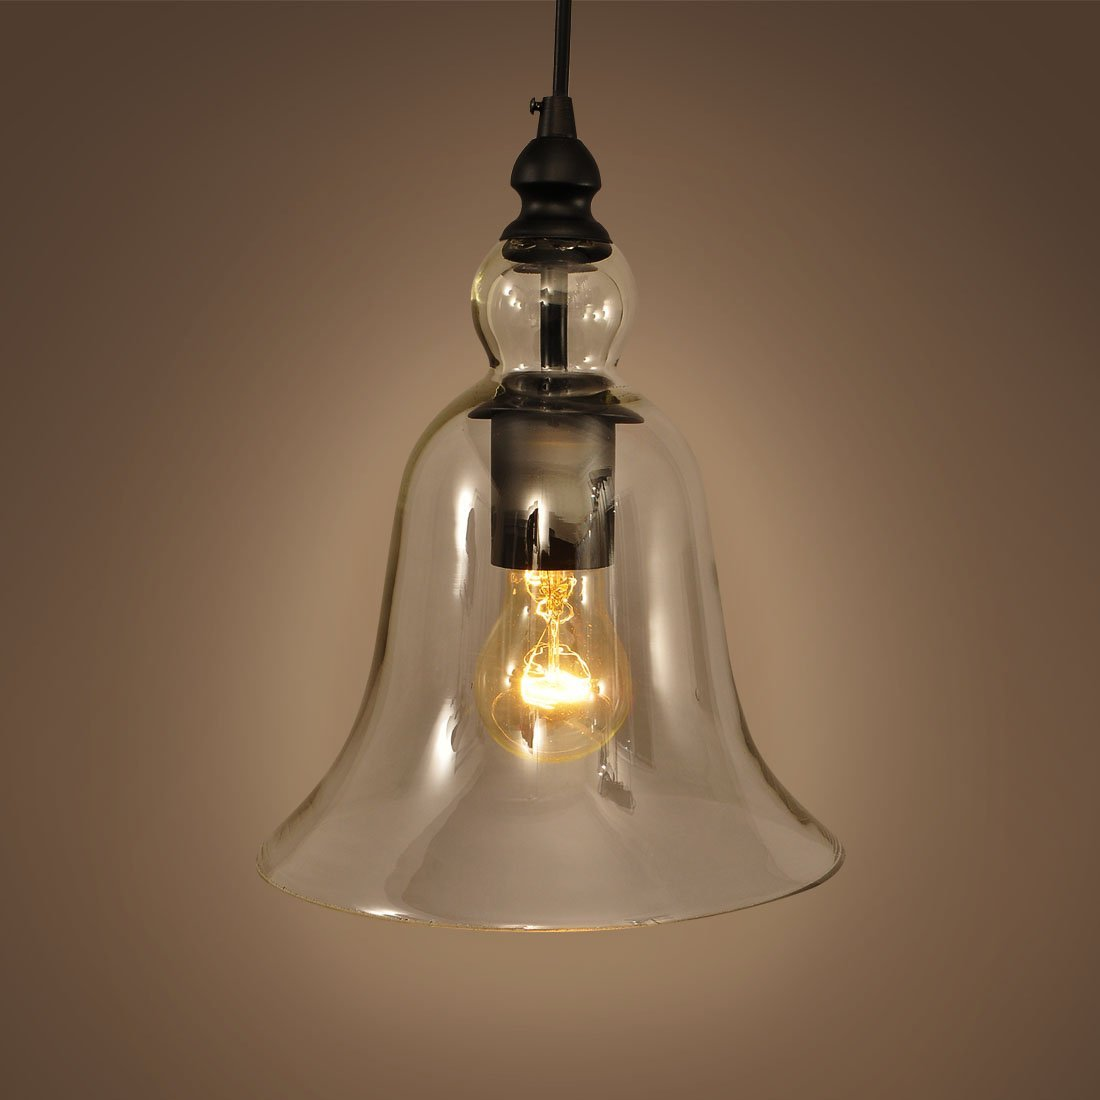 Linenandlavender.net: Lighting